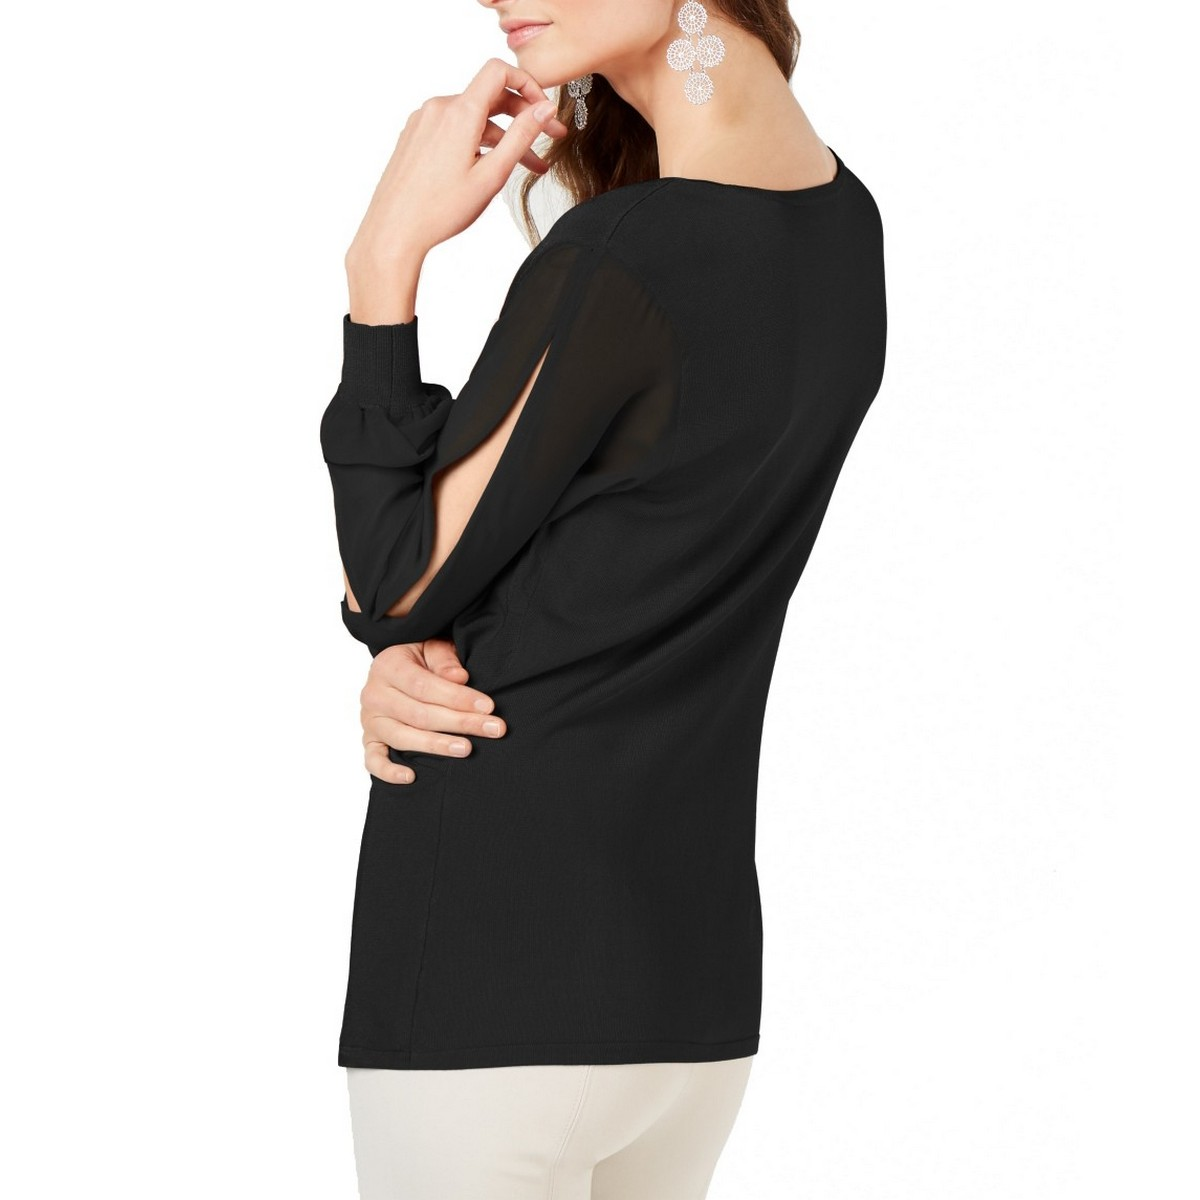 INC-NEW-Women-039-s-Surplice-Illusion-sleeve-Knit-Blouse-Shirt-Top-TEDO thumbnail 3